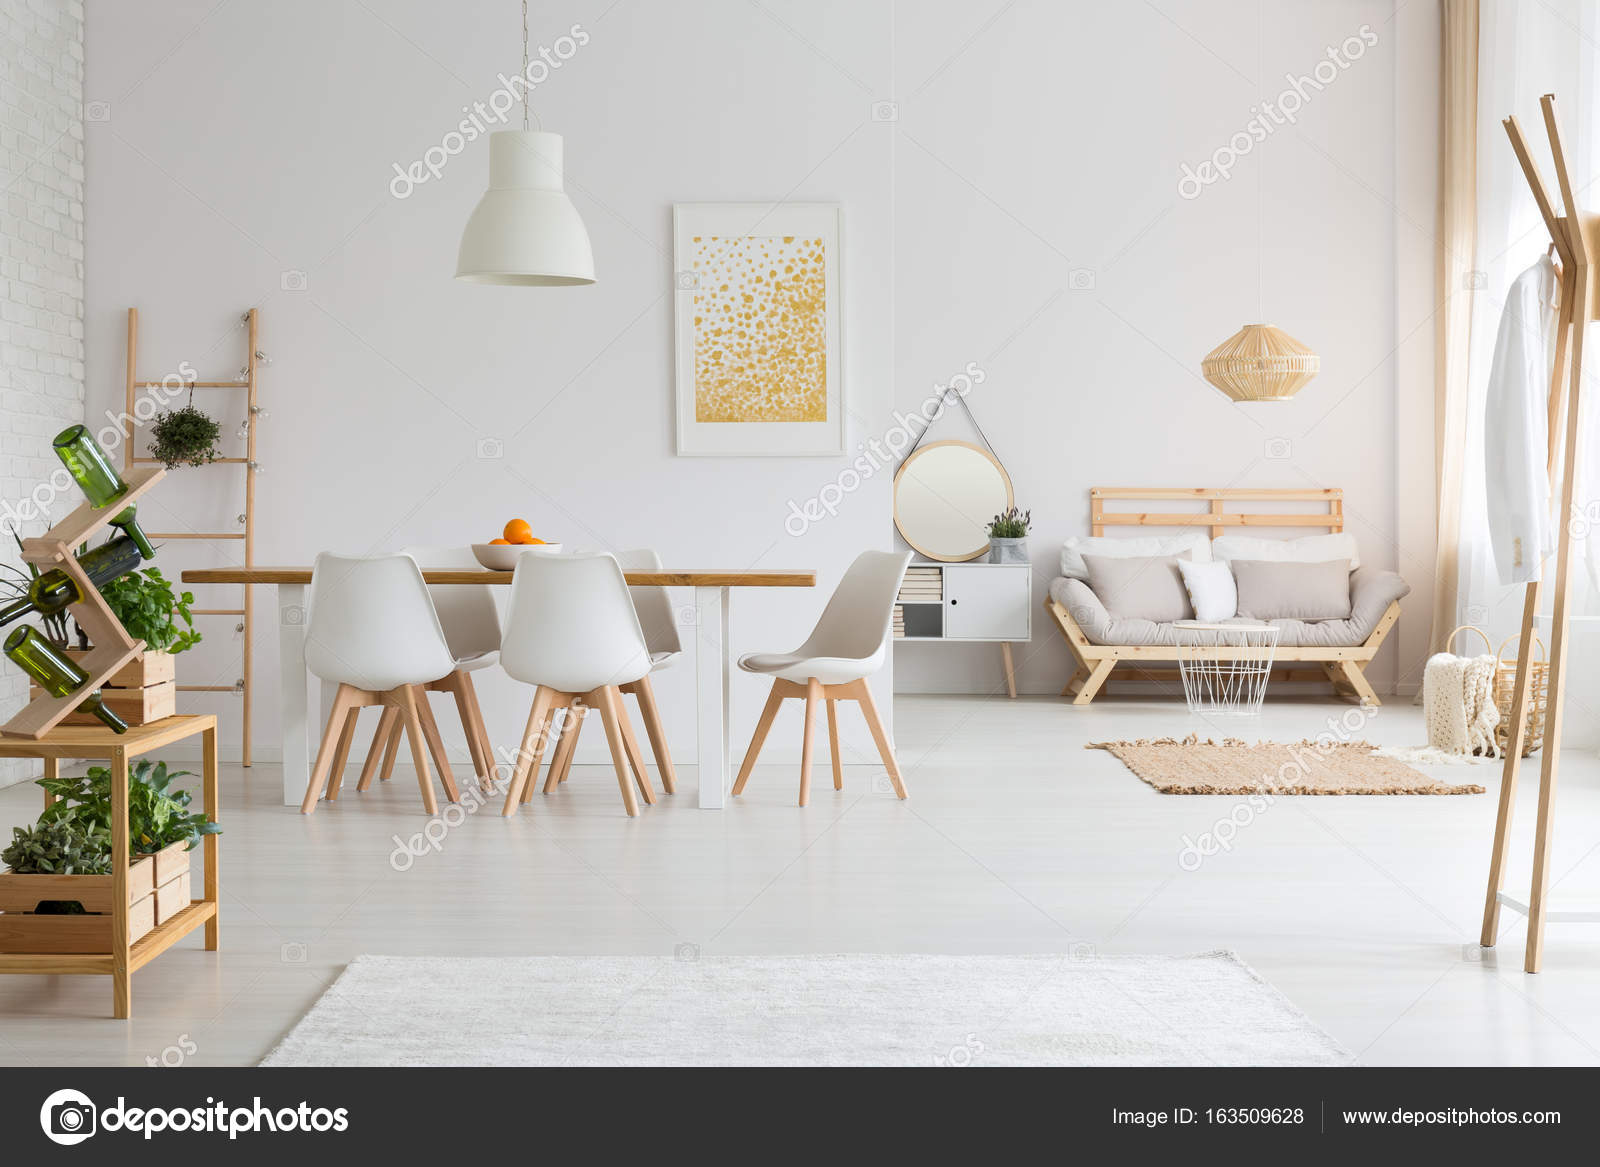 Eetkamer In Woonkamer : Eetkamer en woonkamer in loft u stockfoto photographee eu